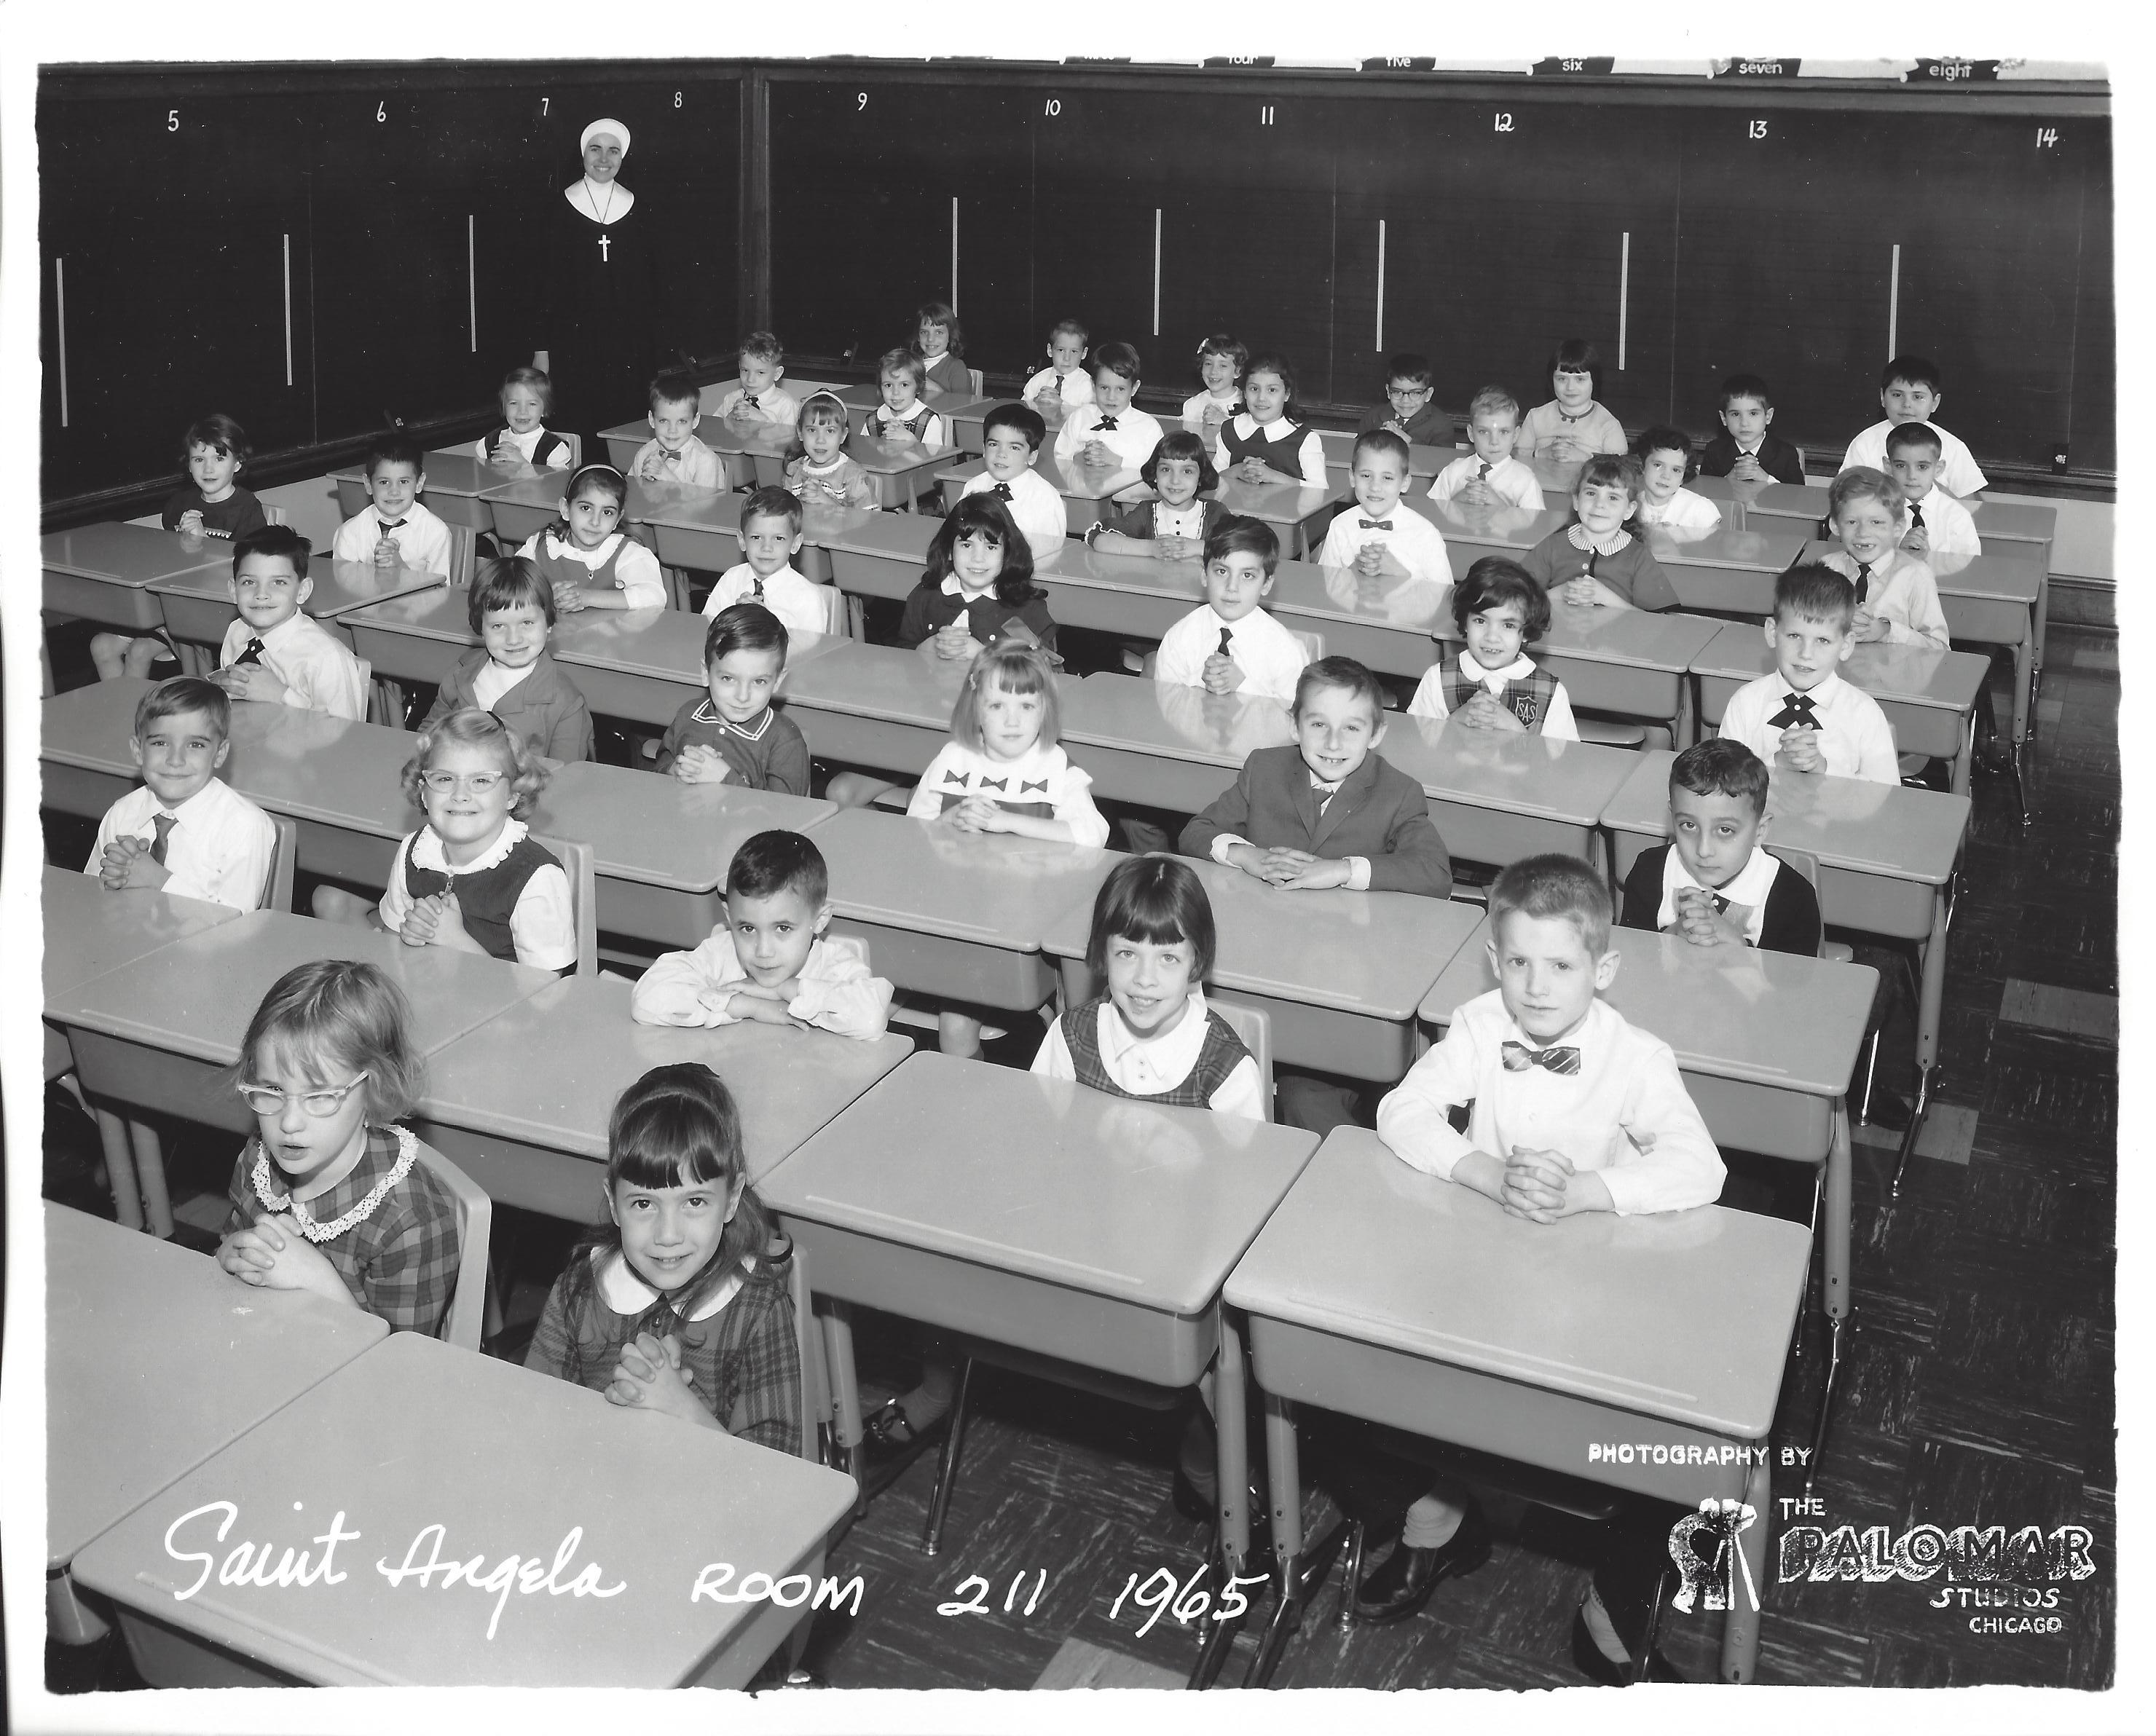 1965 Grade One Room 211